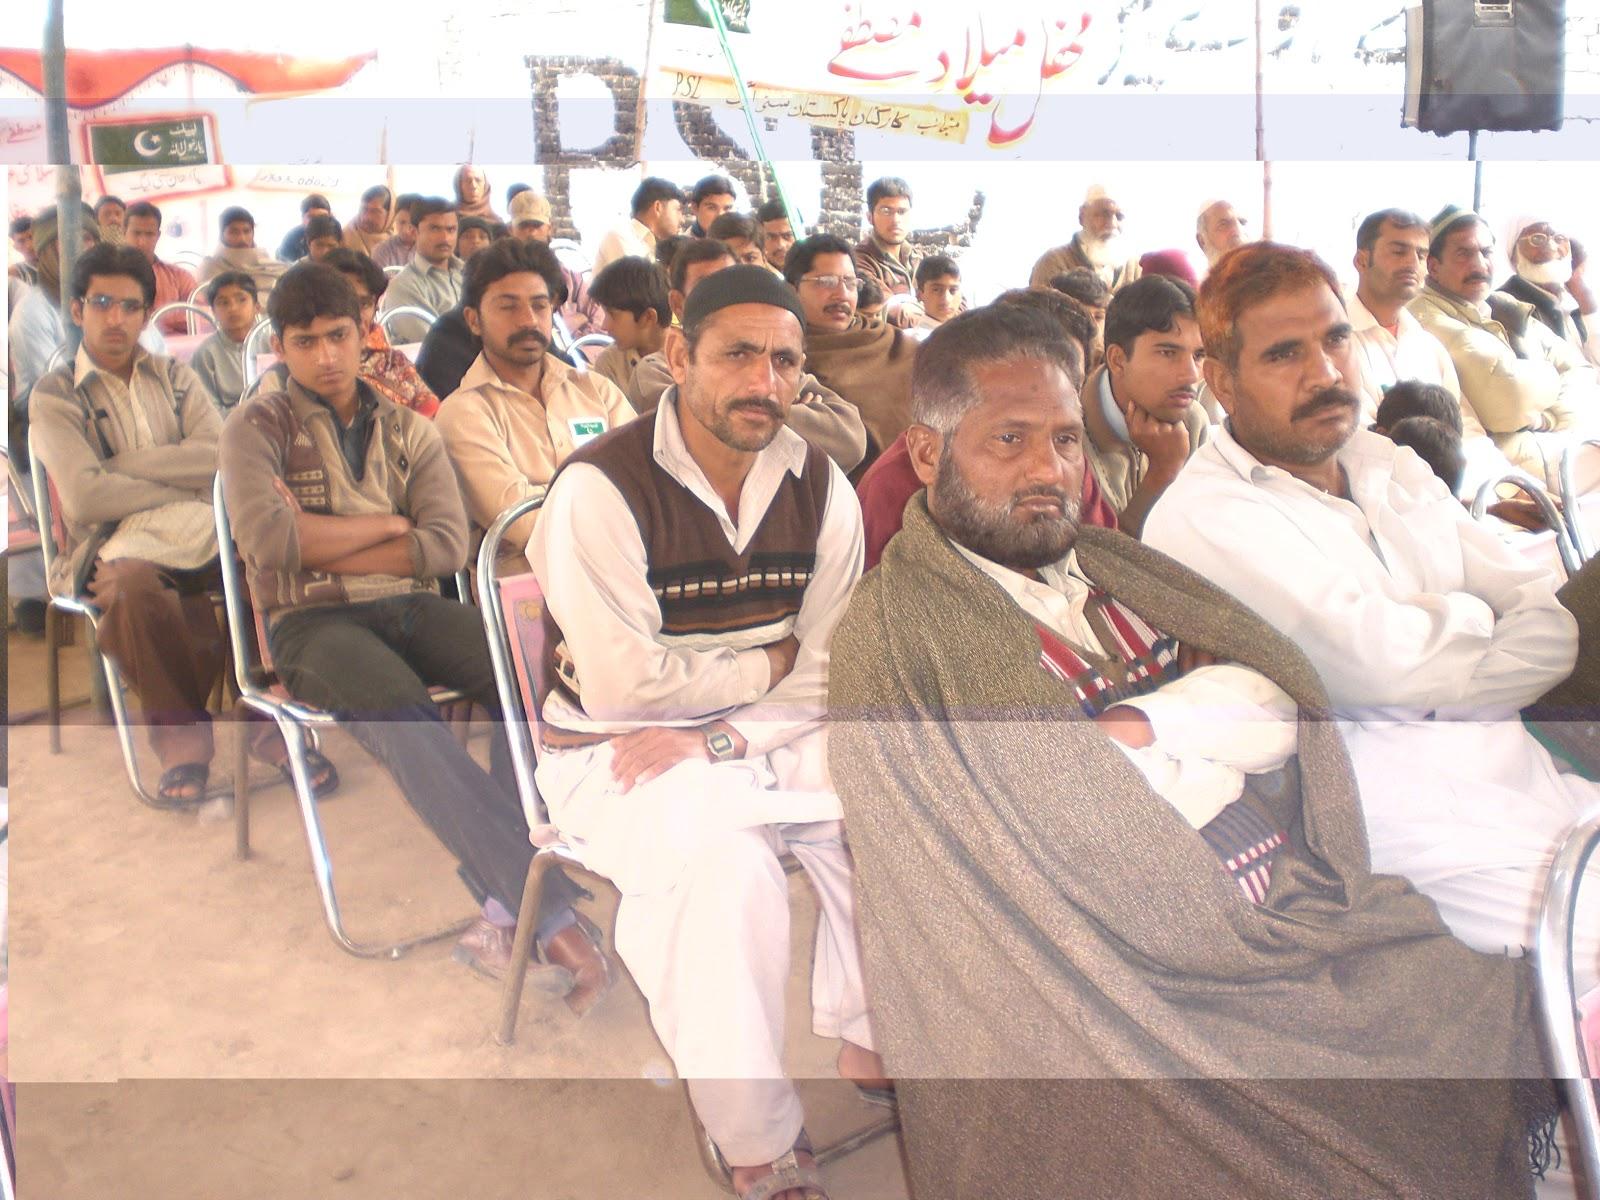 PAKISTAN SUNNI LEAGUE پاکستان سنی لیگ: 12-02-2012 PSL Pakistan sunni